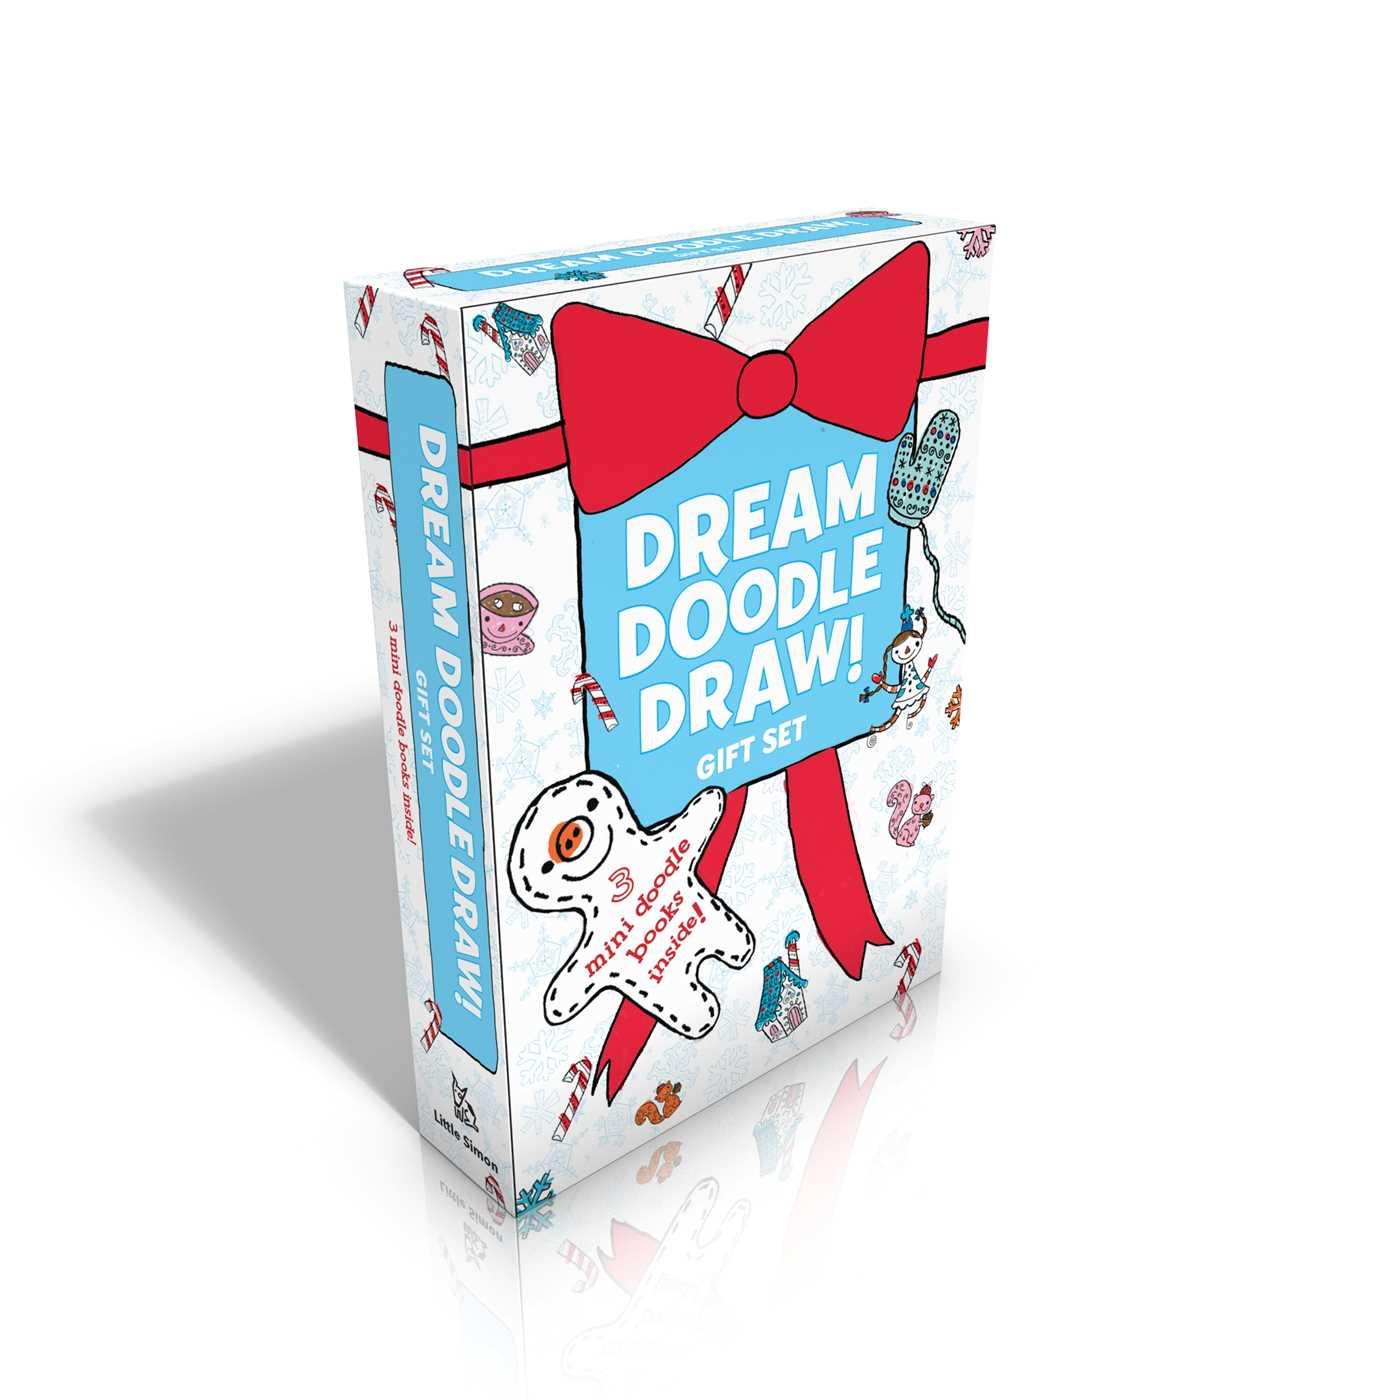 Dream doodle draw gift set 9781481471596 hr